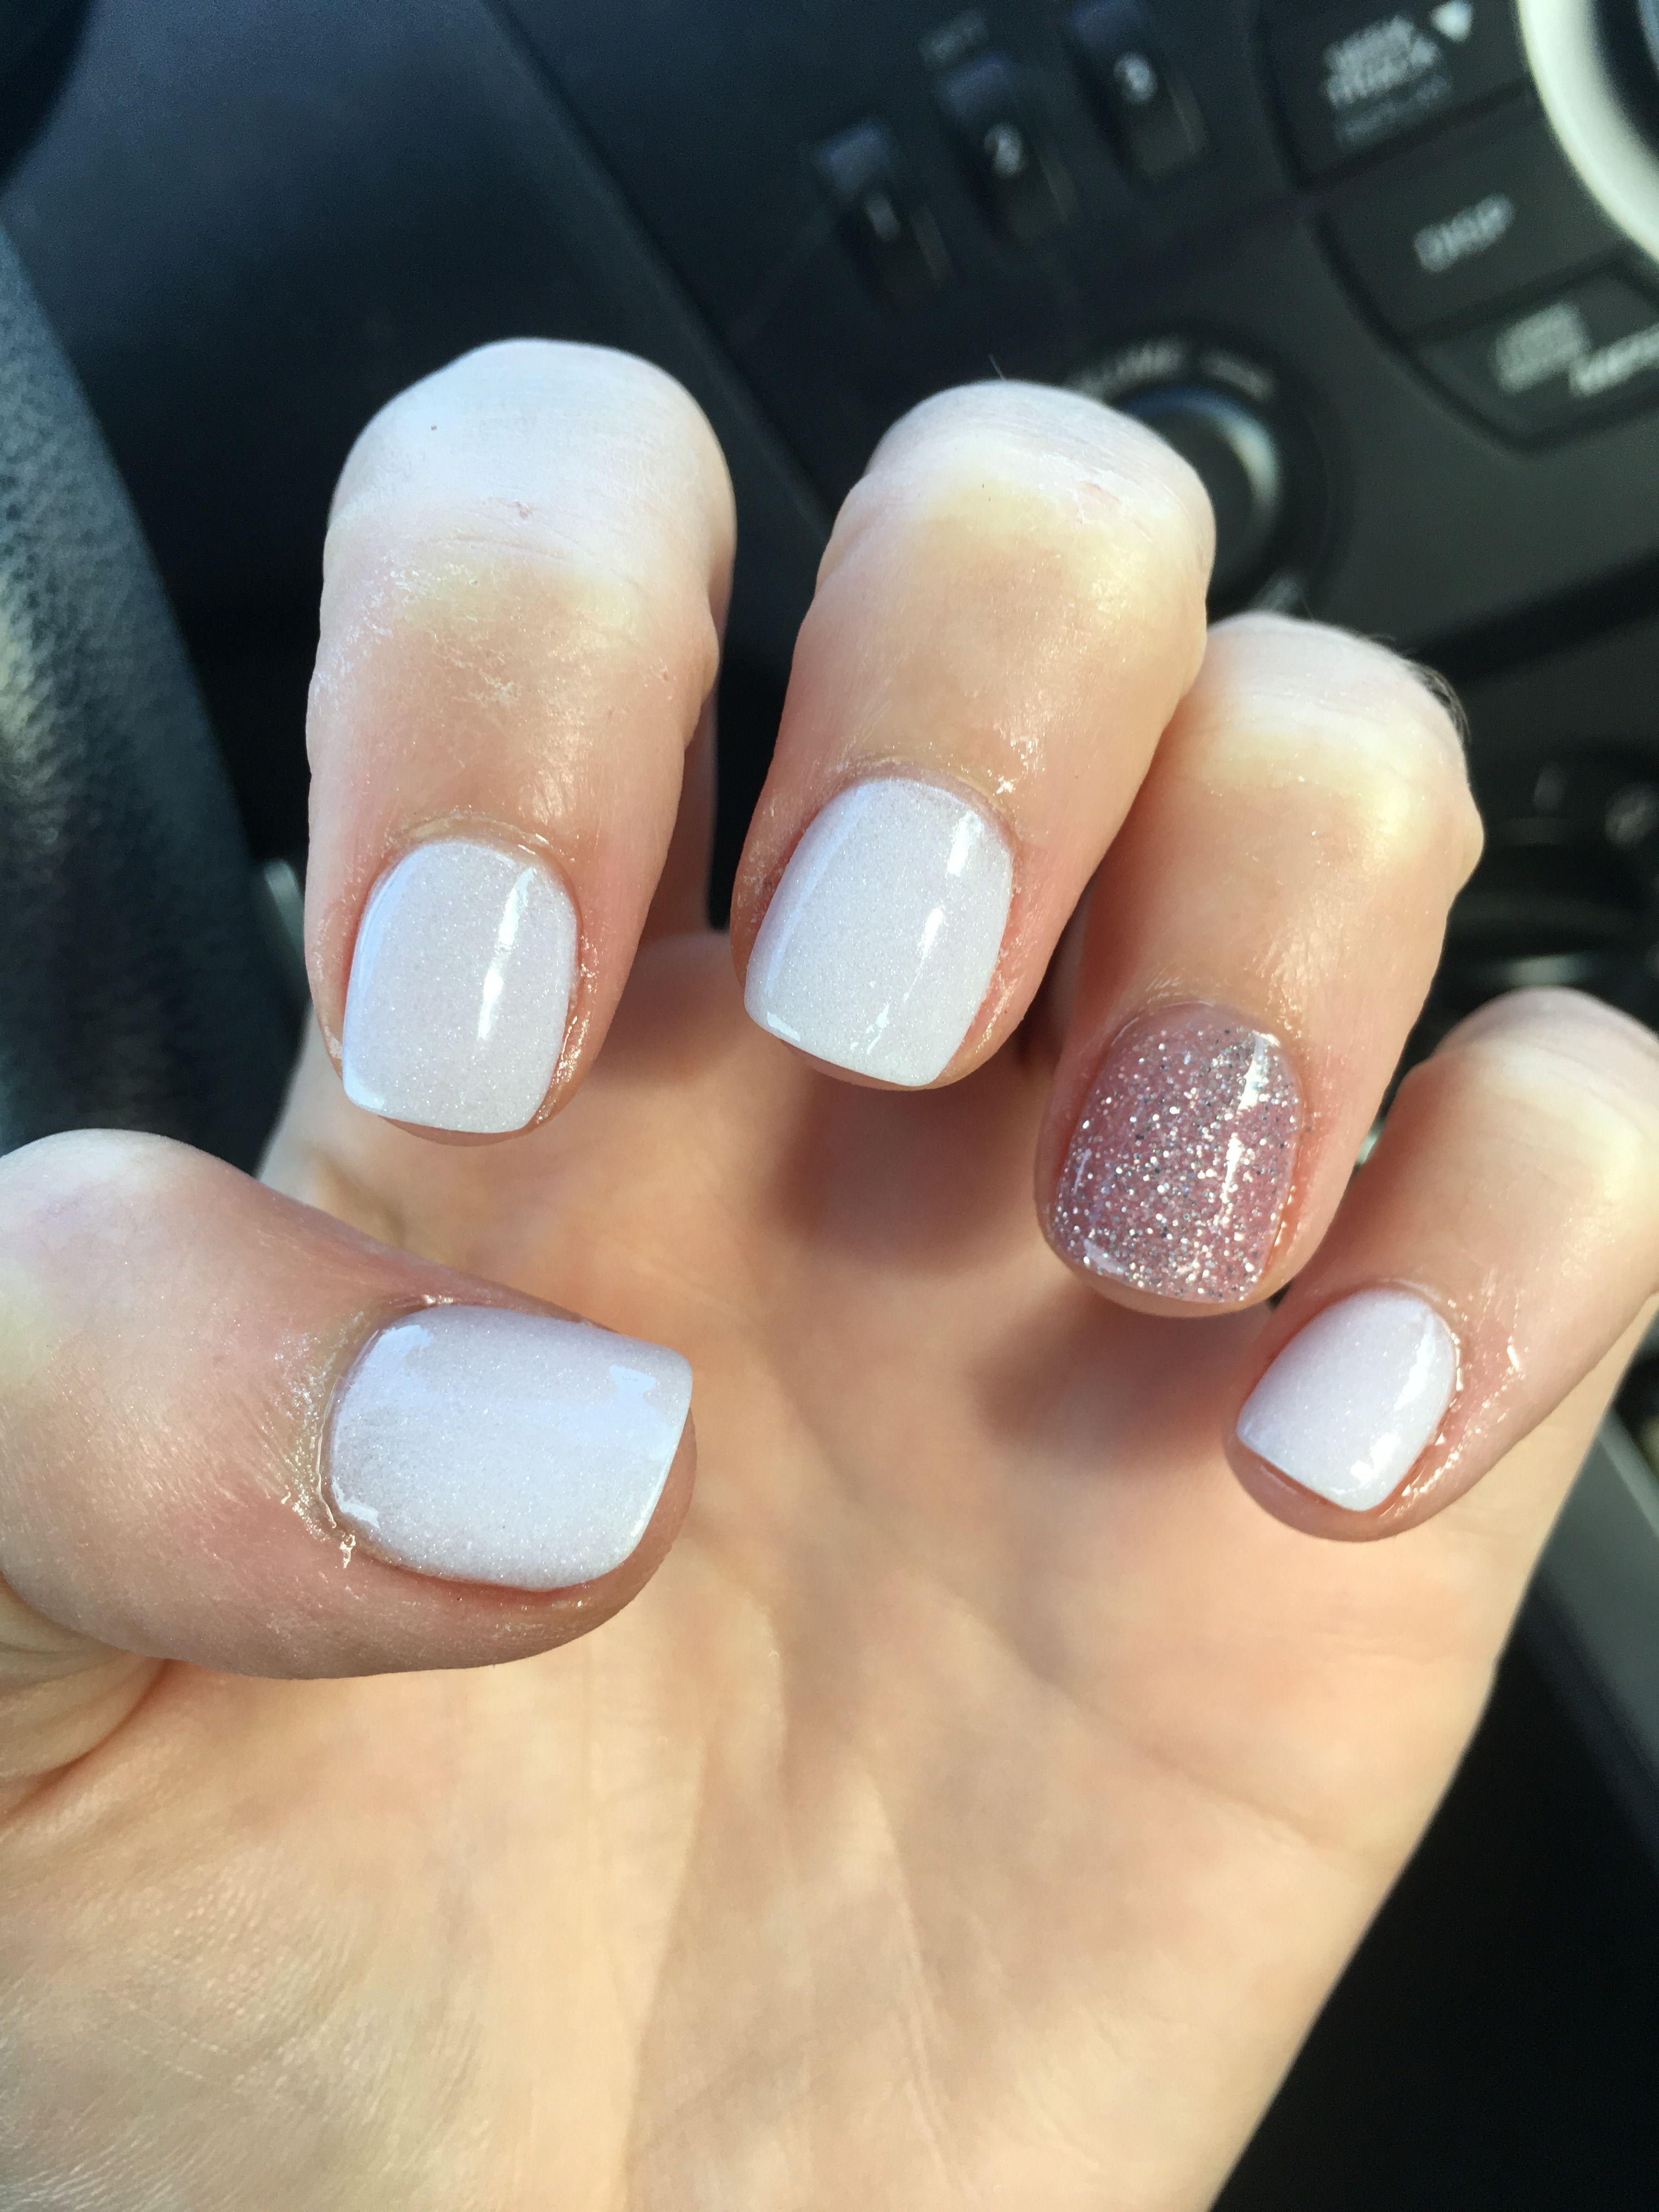 New Year 2018 Nexgen acrylic nail dip | Nailed it! | Pinterest ...